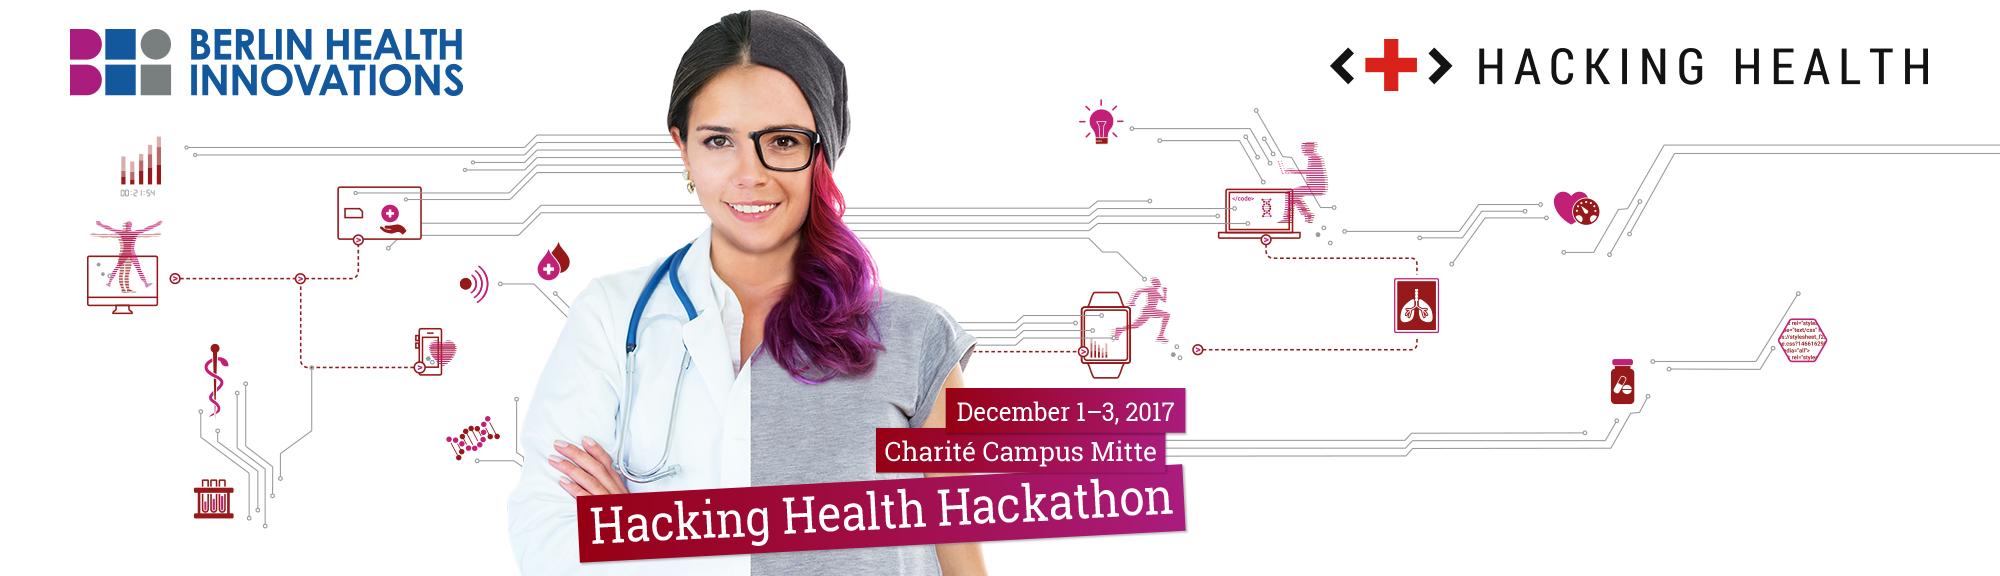 Hacking Health Hackathon Powered By Berlin Health Innovations Bhi Hacking Health